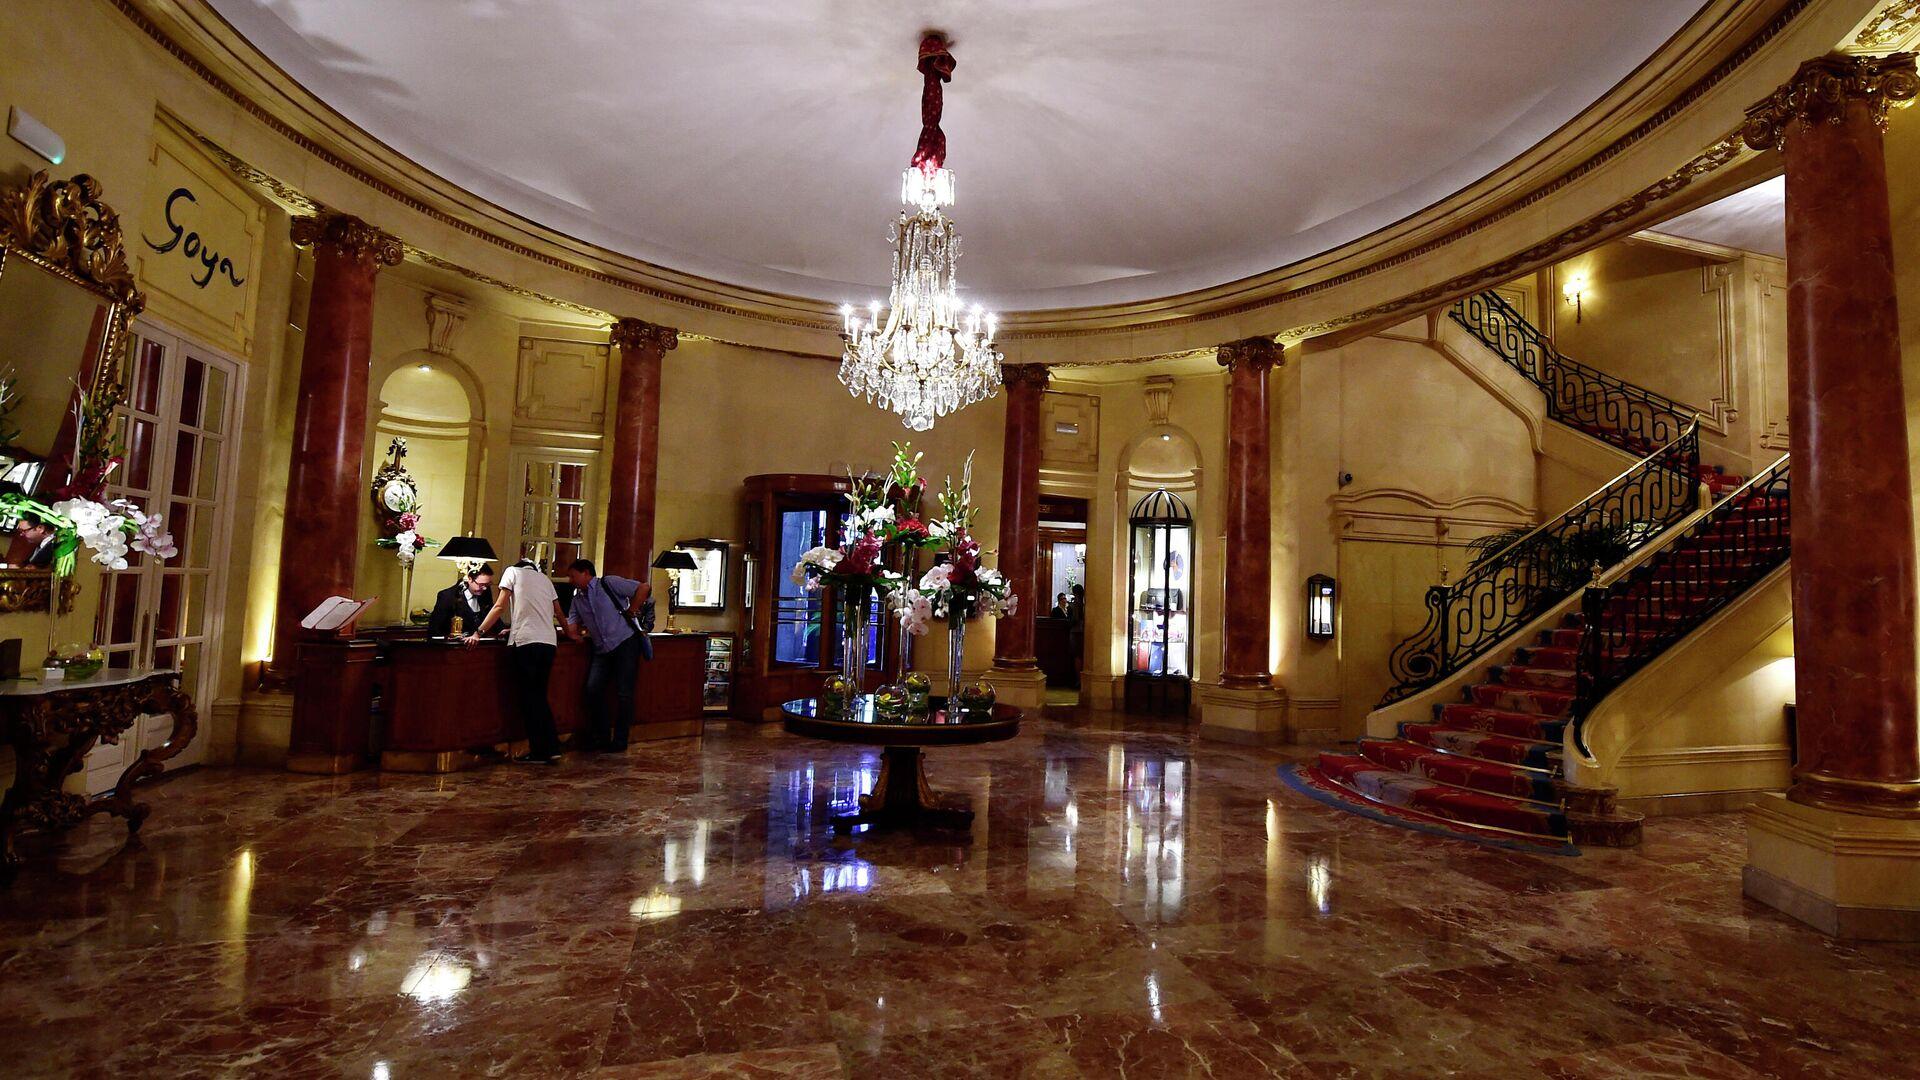 Imagen referencial del Hotel Ritz de Madrid - Sputnik Mundo, 1920, 15.04.2021